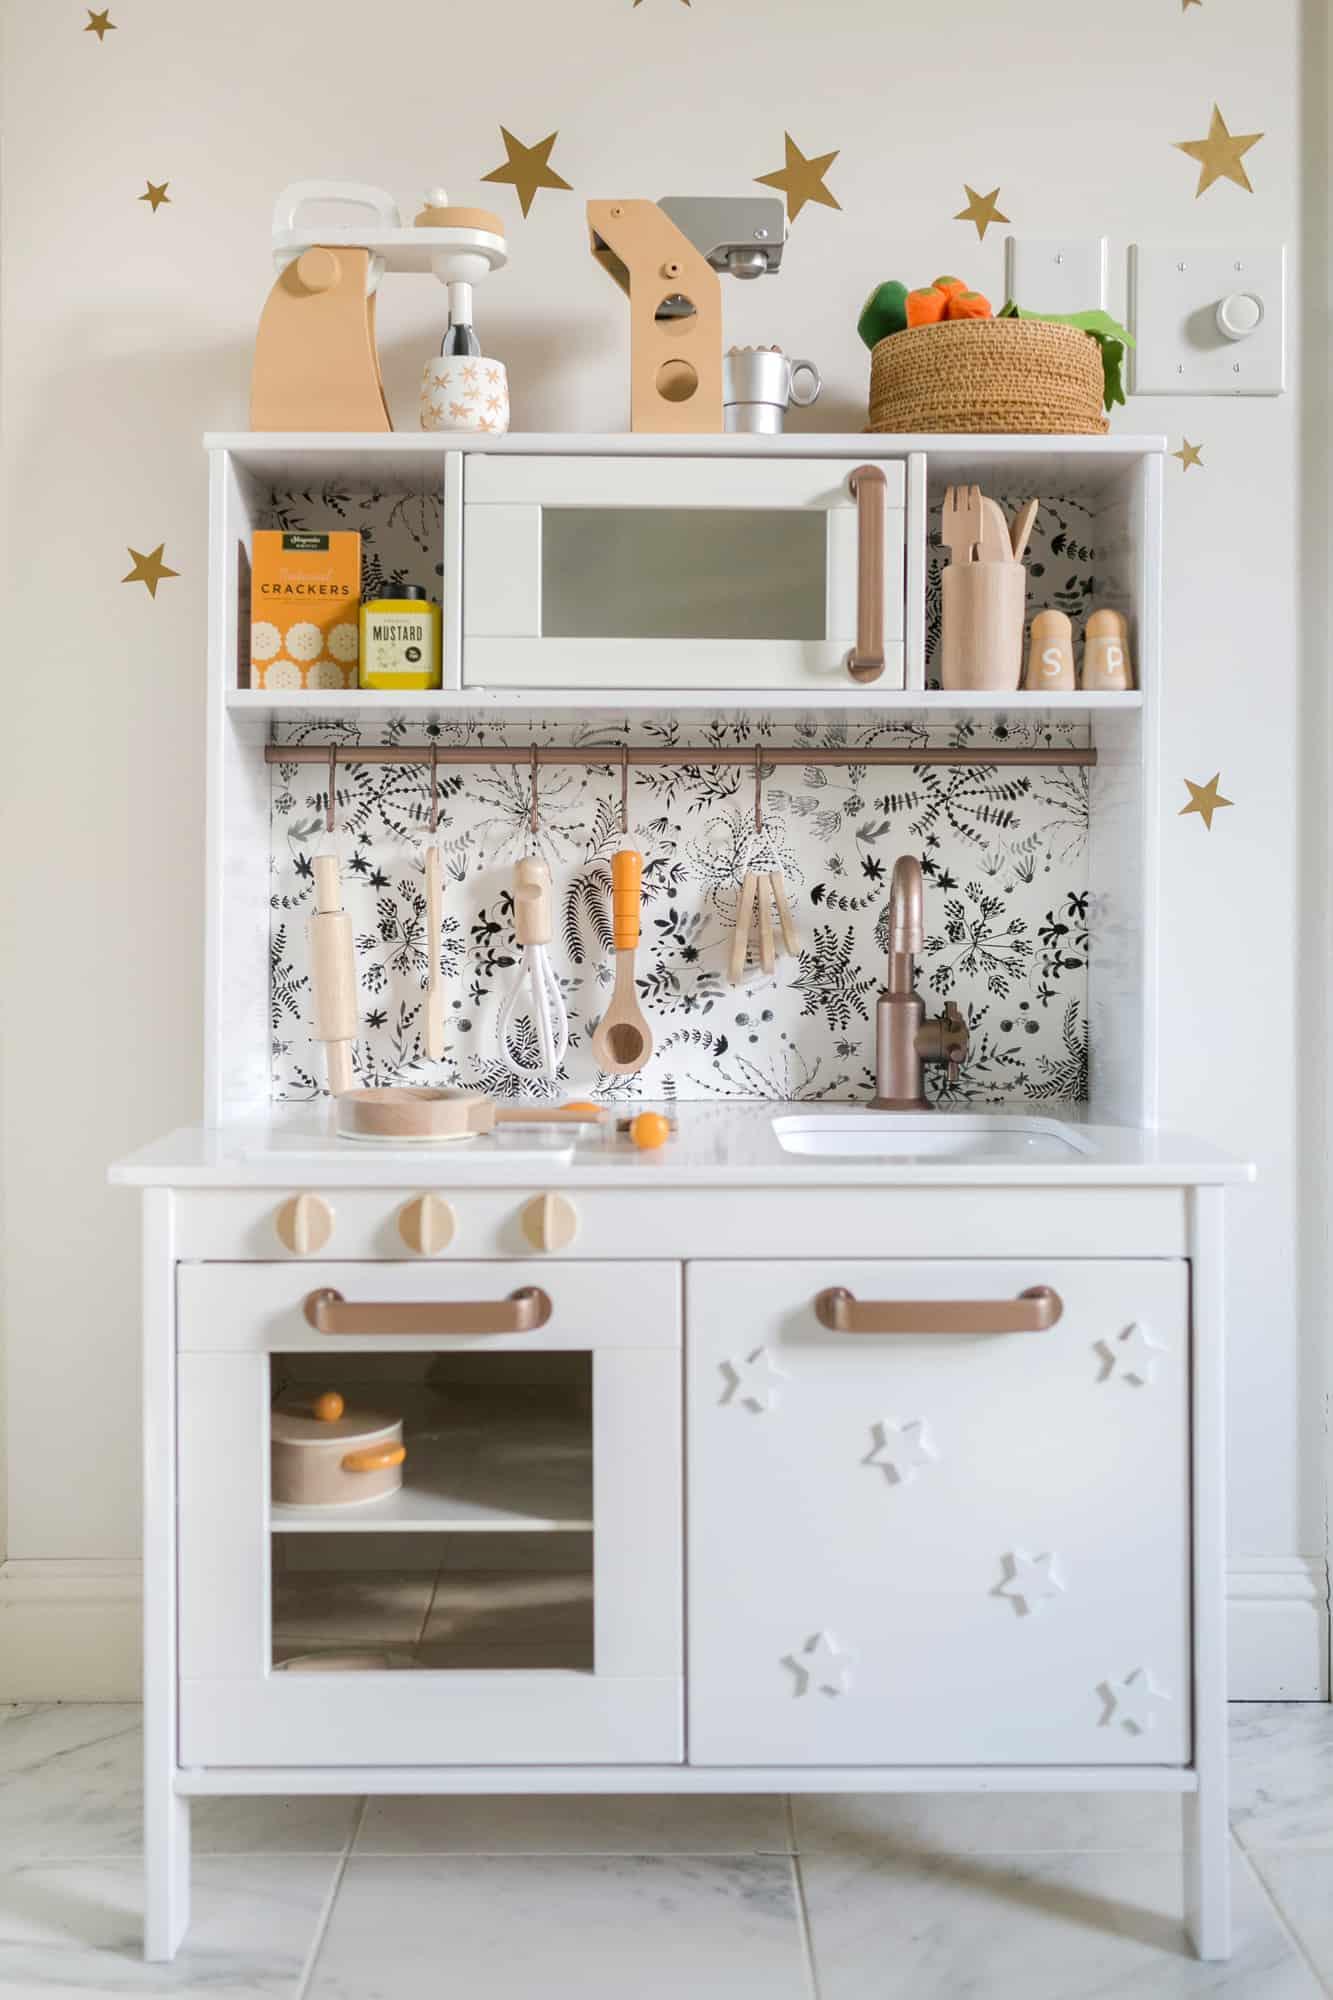 Nova's Play Kitchen (IKEA Hack)